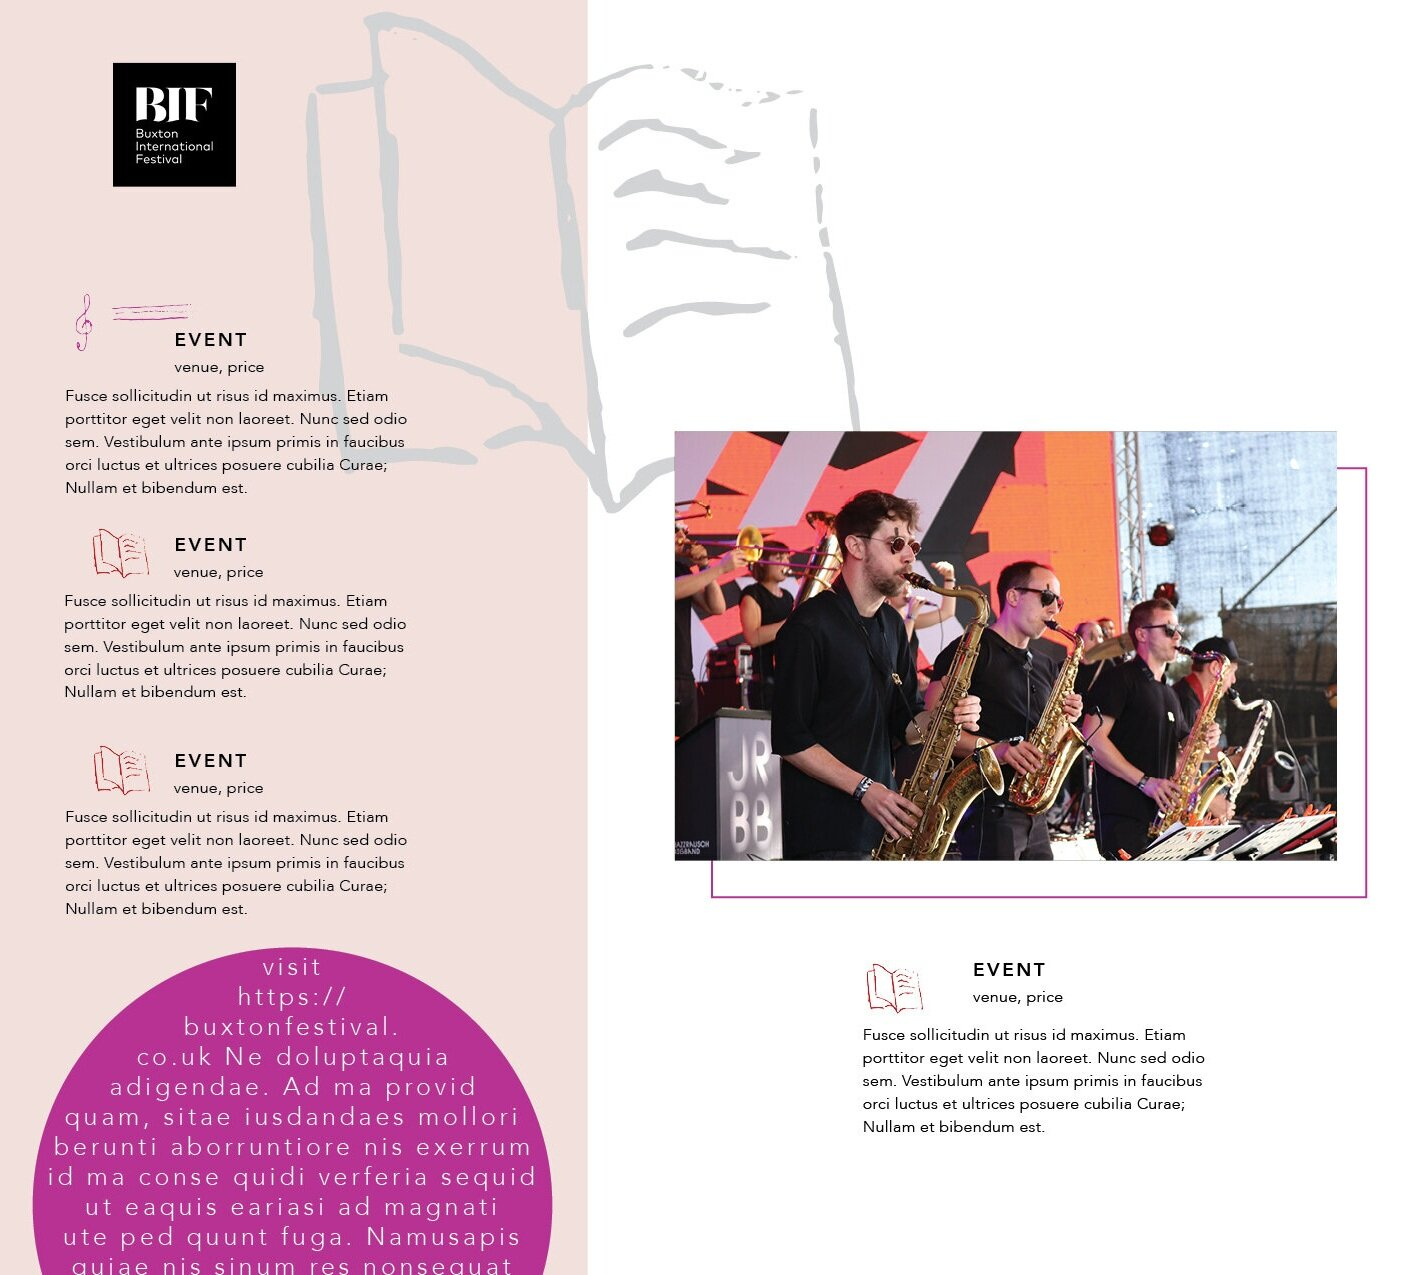 Buxton+International+Festival+Proposal+Lizzie+Quirke+v0.43.jpg